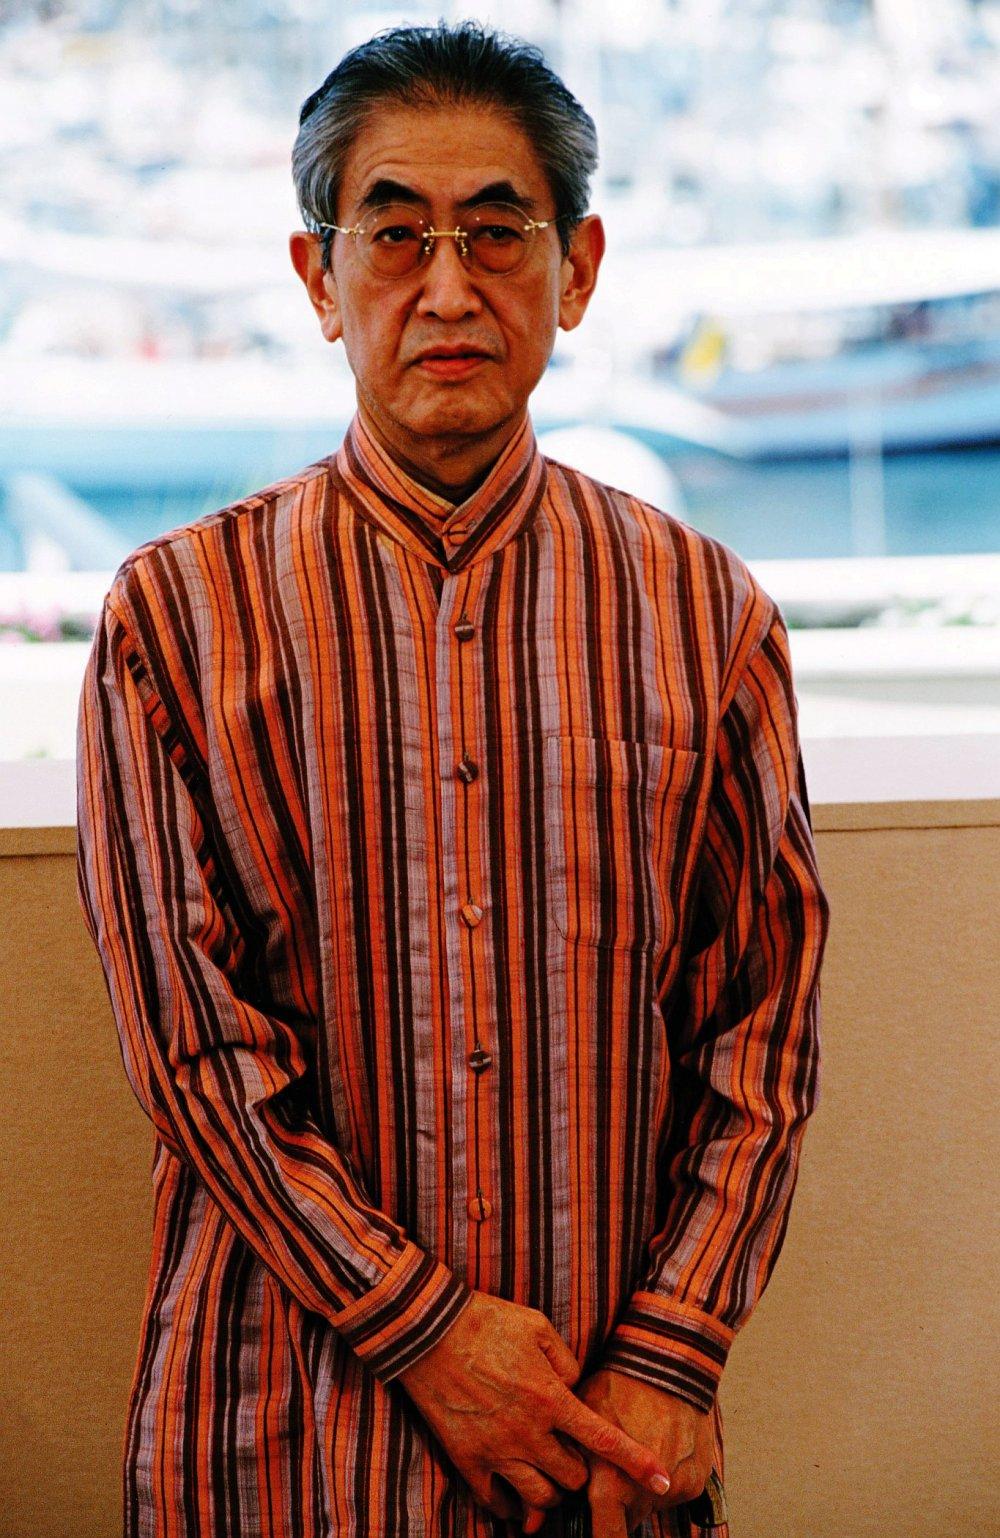 Rebel with a cause: Oshima Nagisa